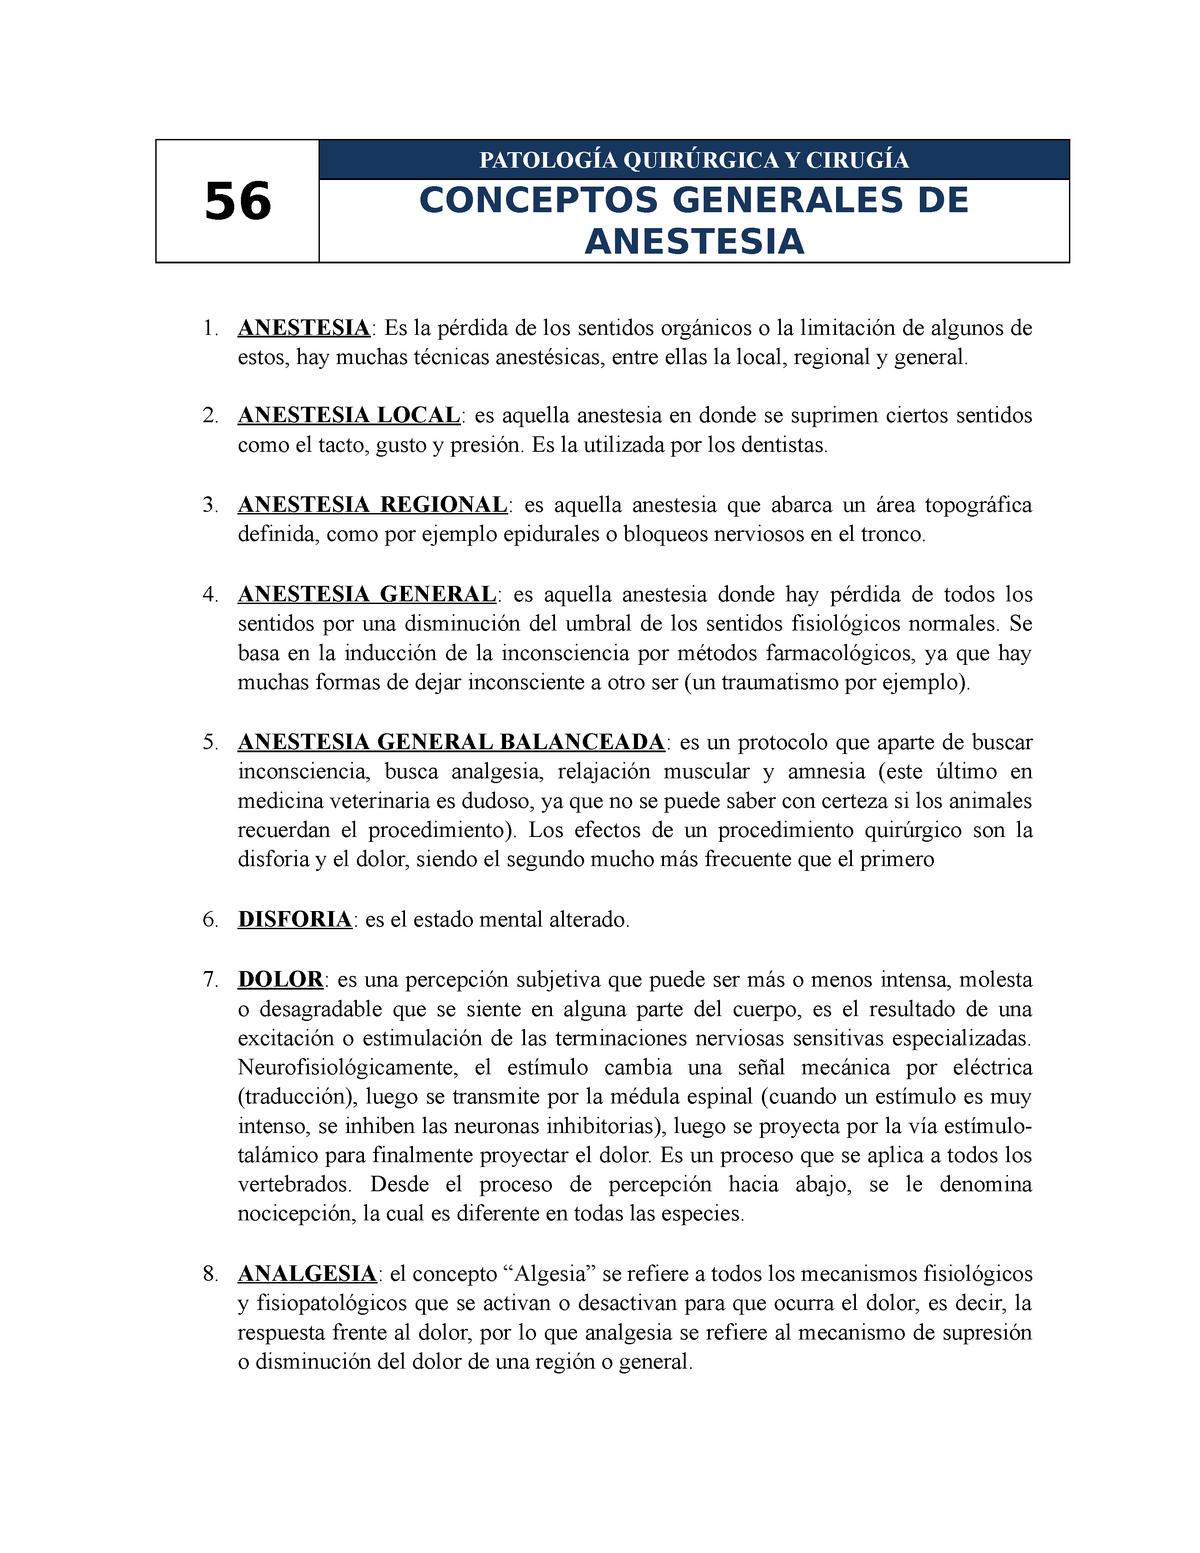 tipos de anestesia general veterinaria